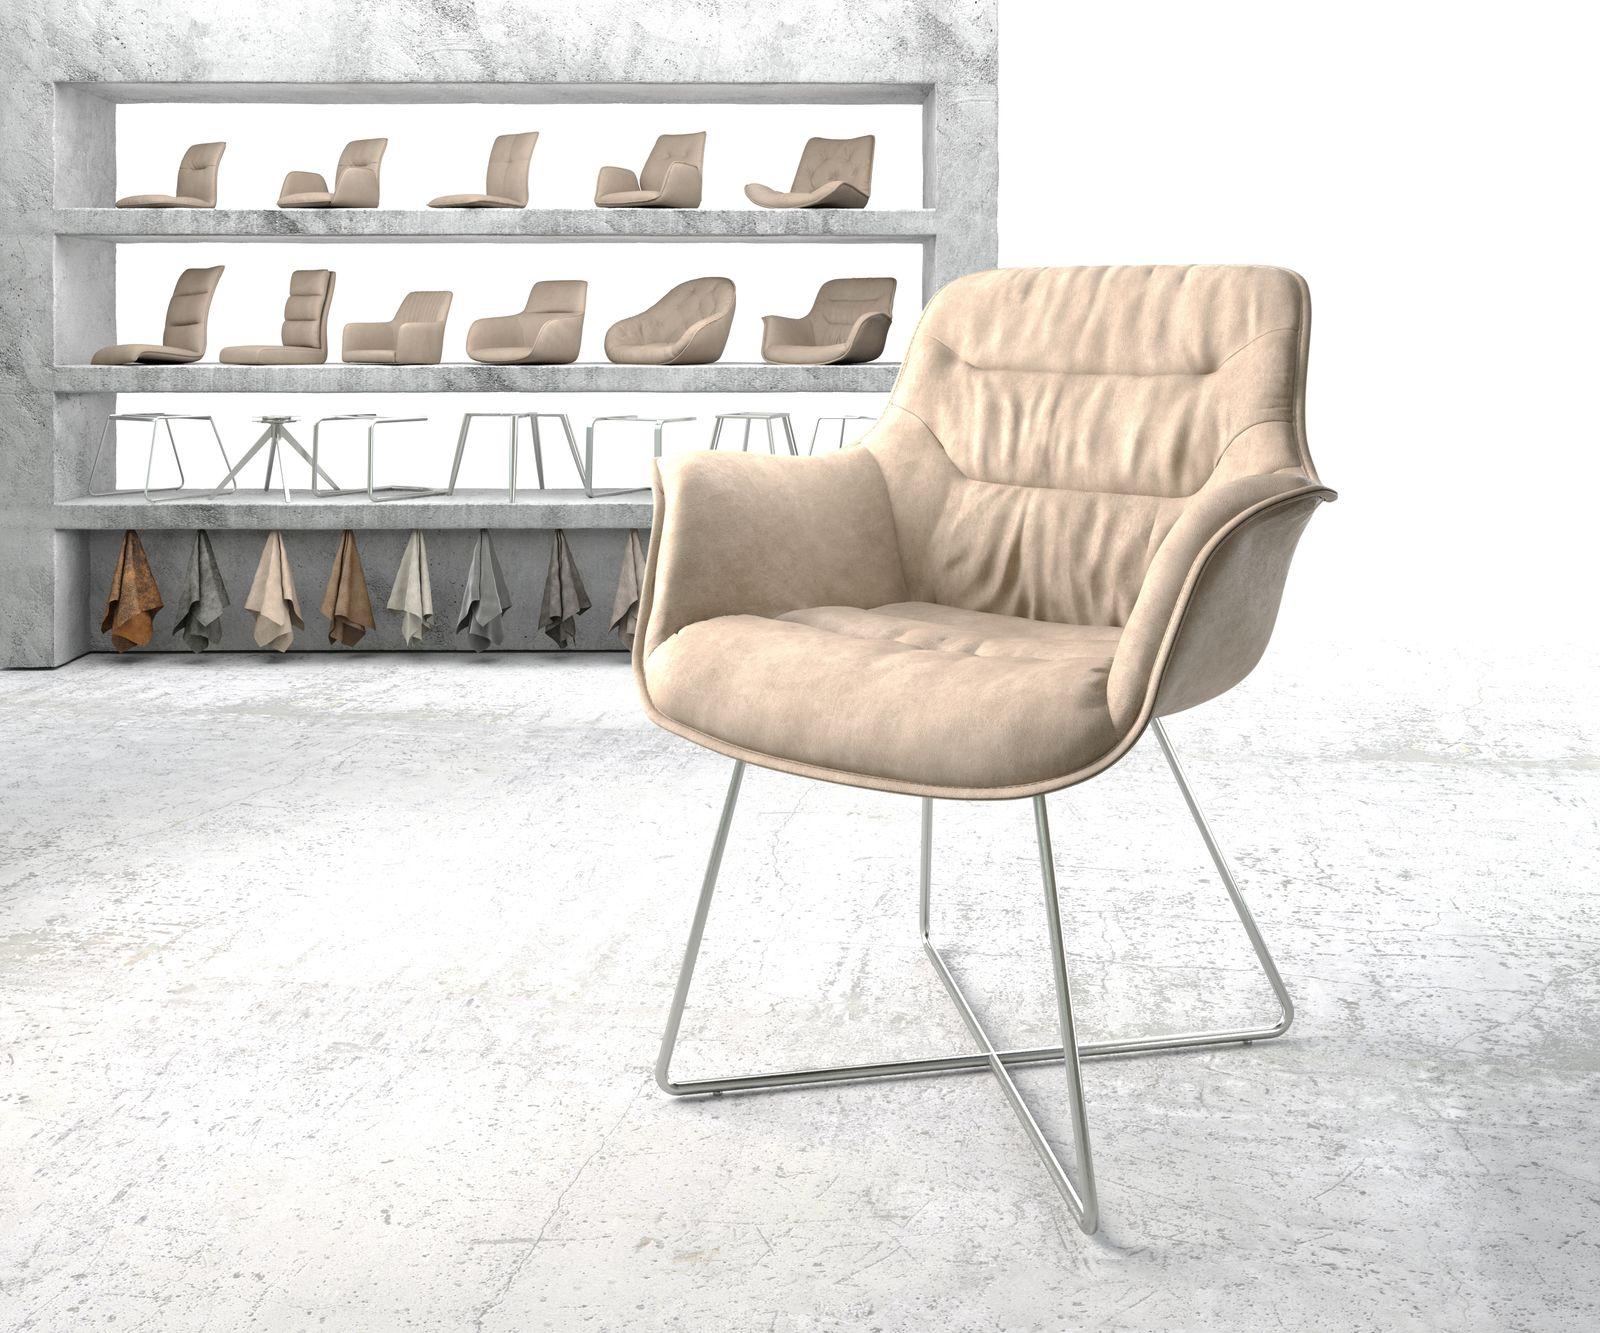 delife-armlehnstuhl-kaira-flex-beige-vintage-x-gestell-edelstahl-esszimmerstuhle